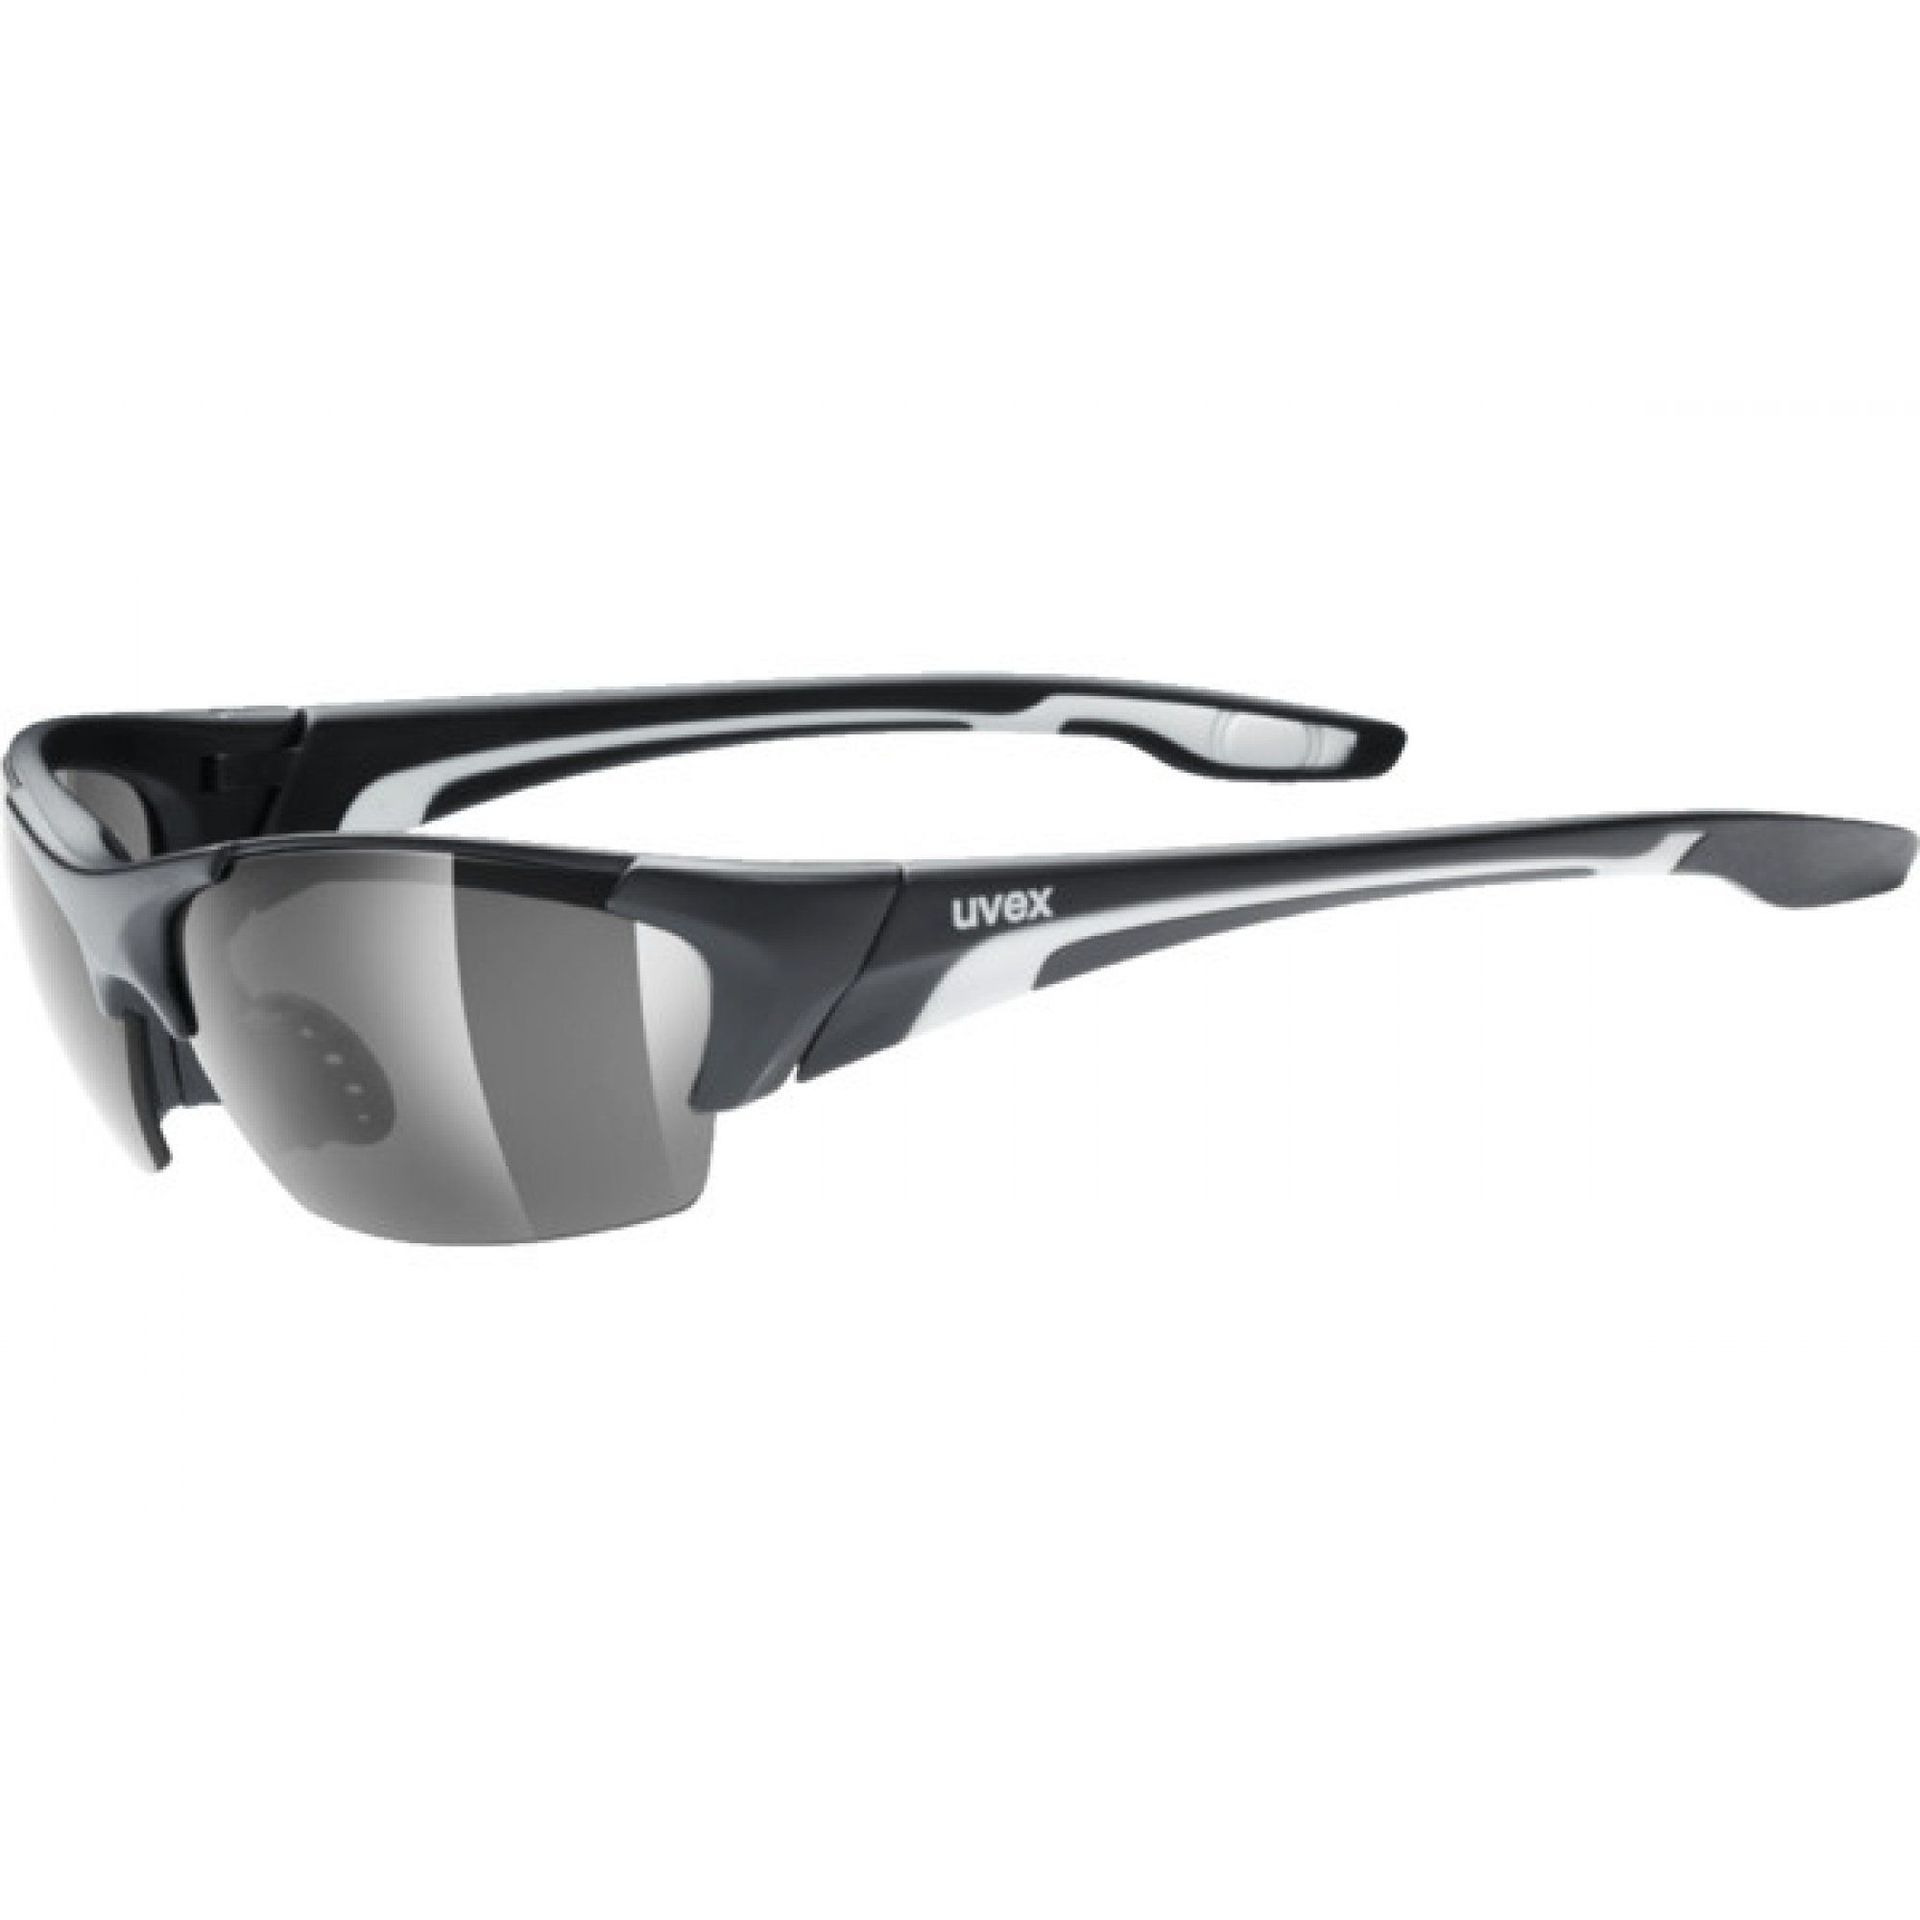 OKULARY UVEX BLAZE III 604|2210 BLACK MAT